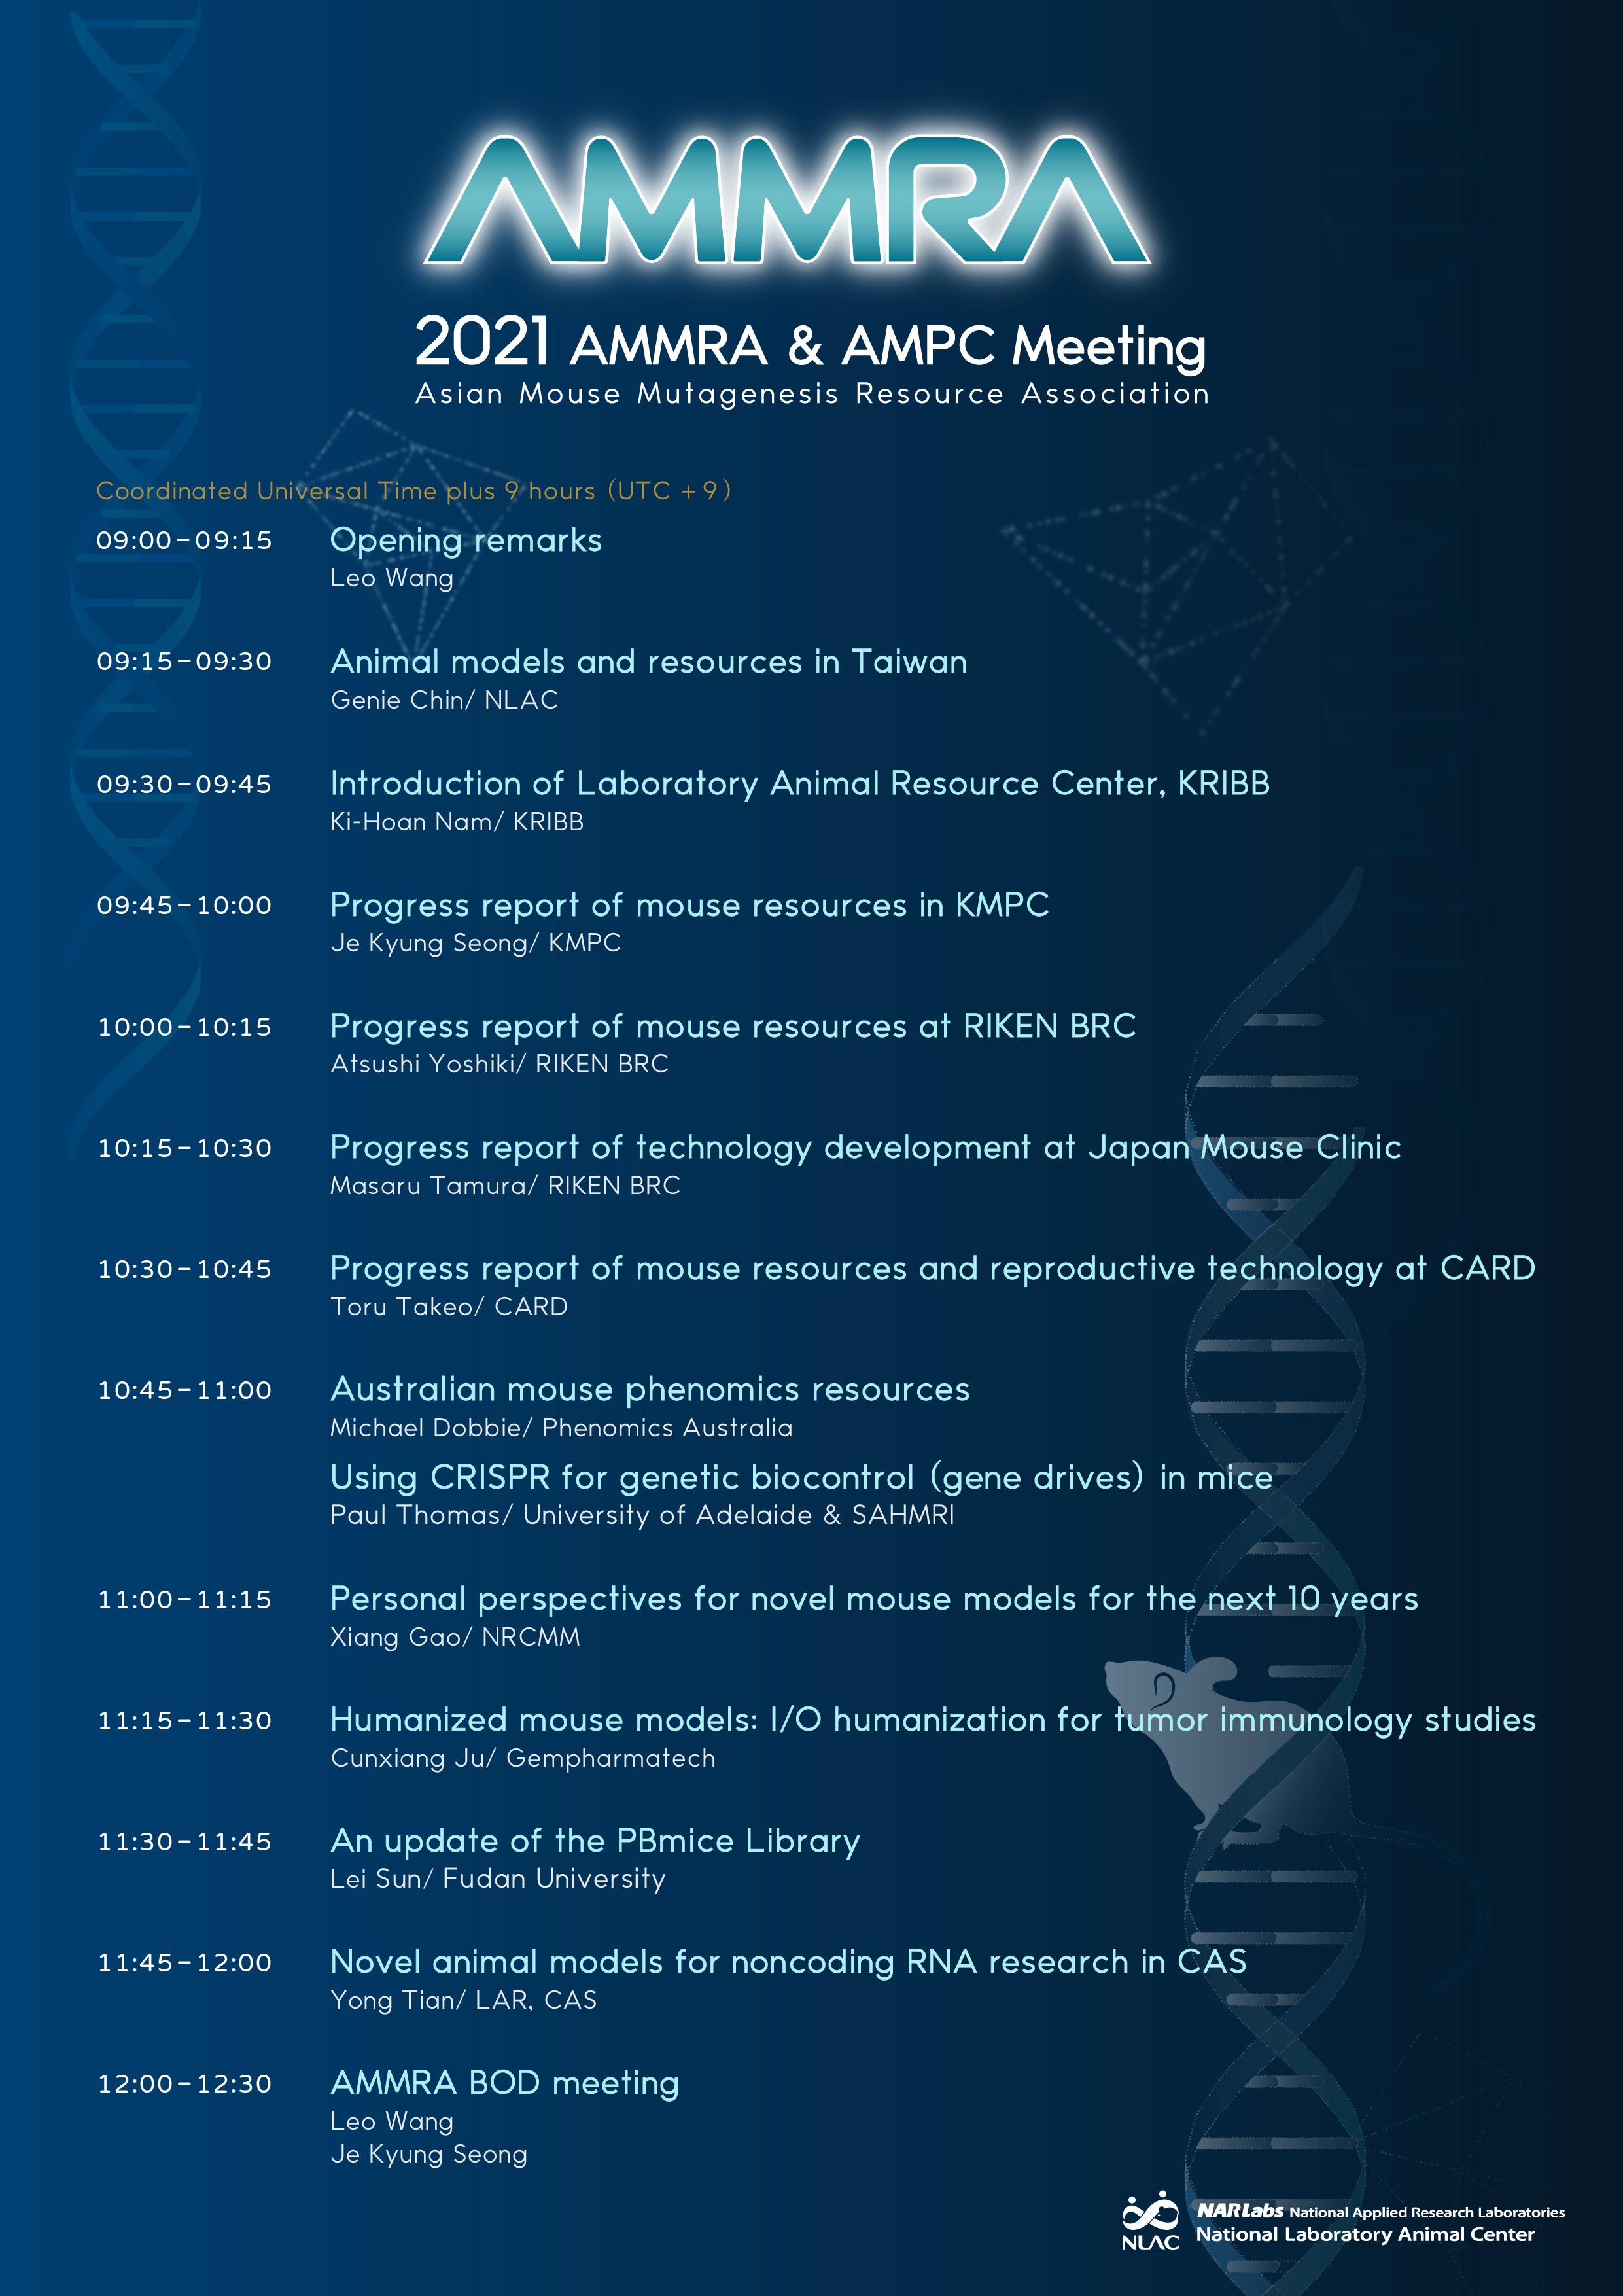 2021 AMMRA agenda-Tokyo Seoul time.png